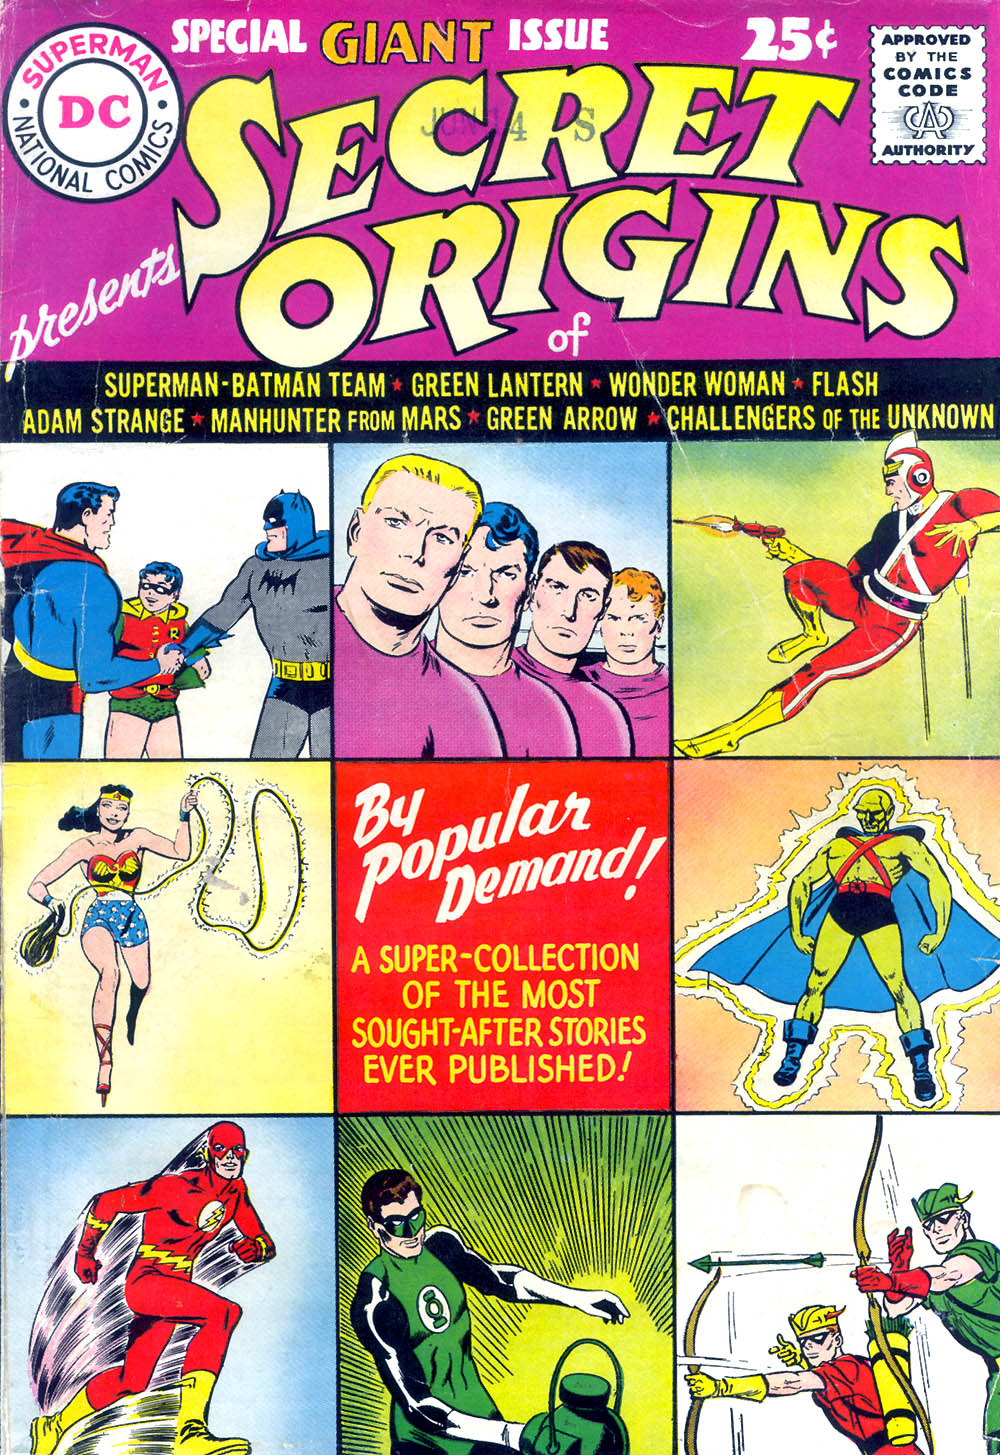 Secret Origins (1961) Full Page 1